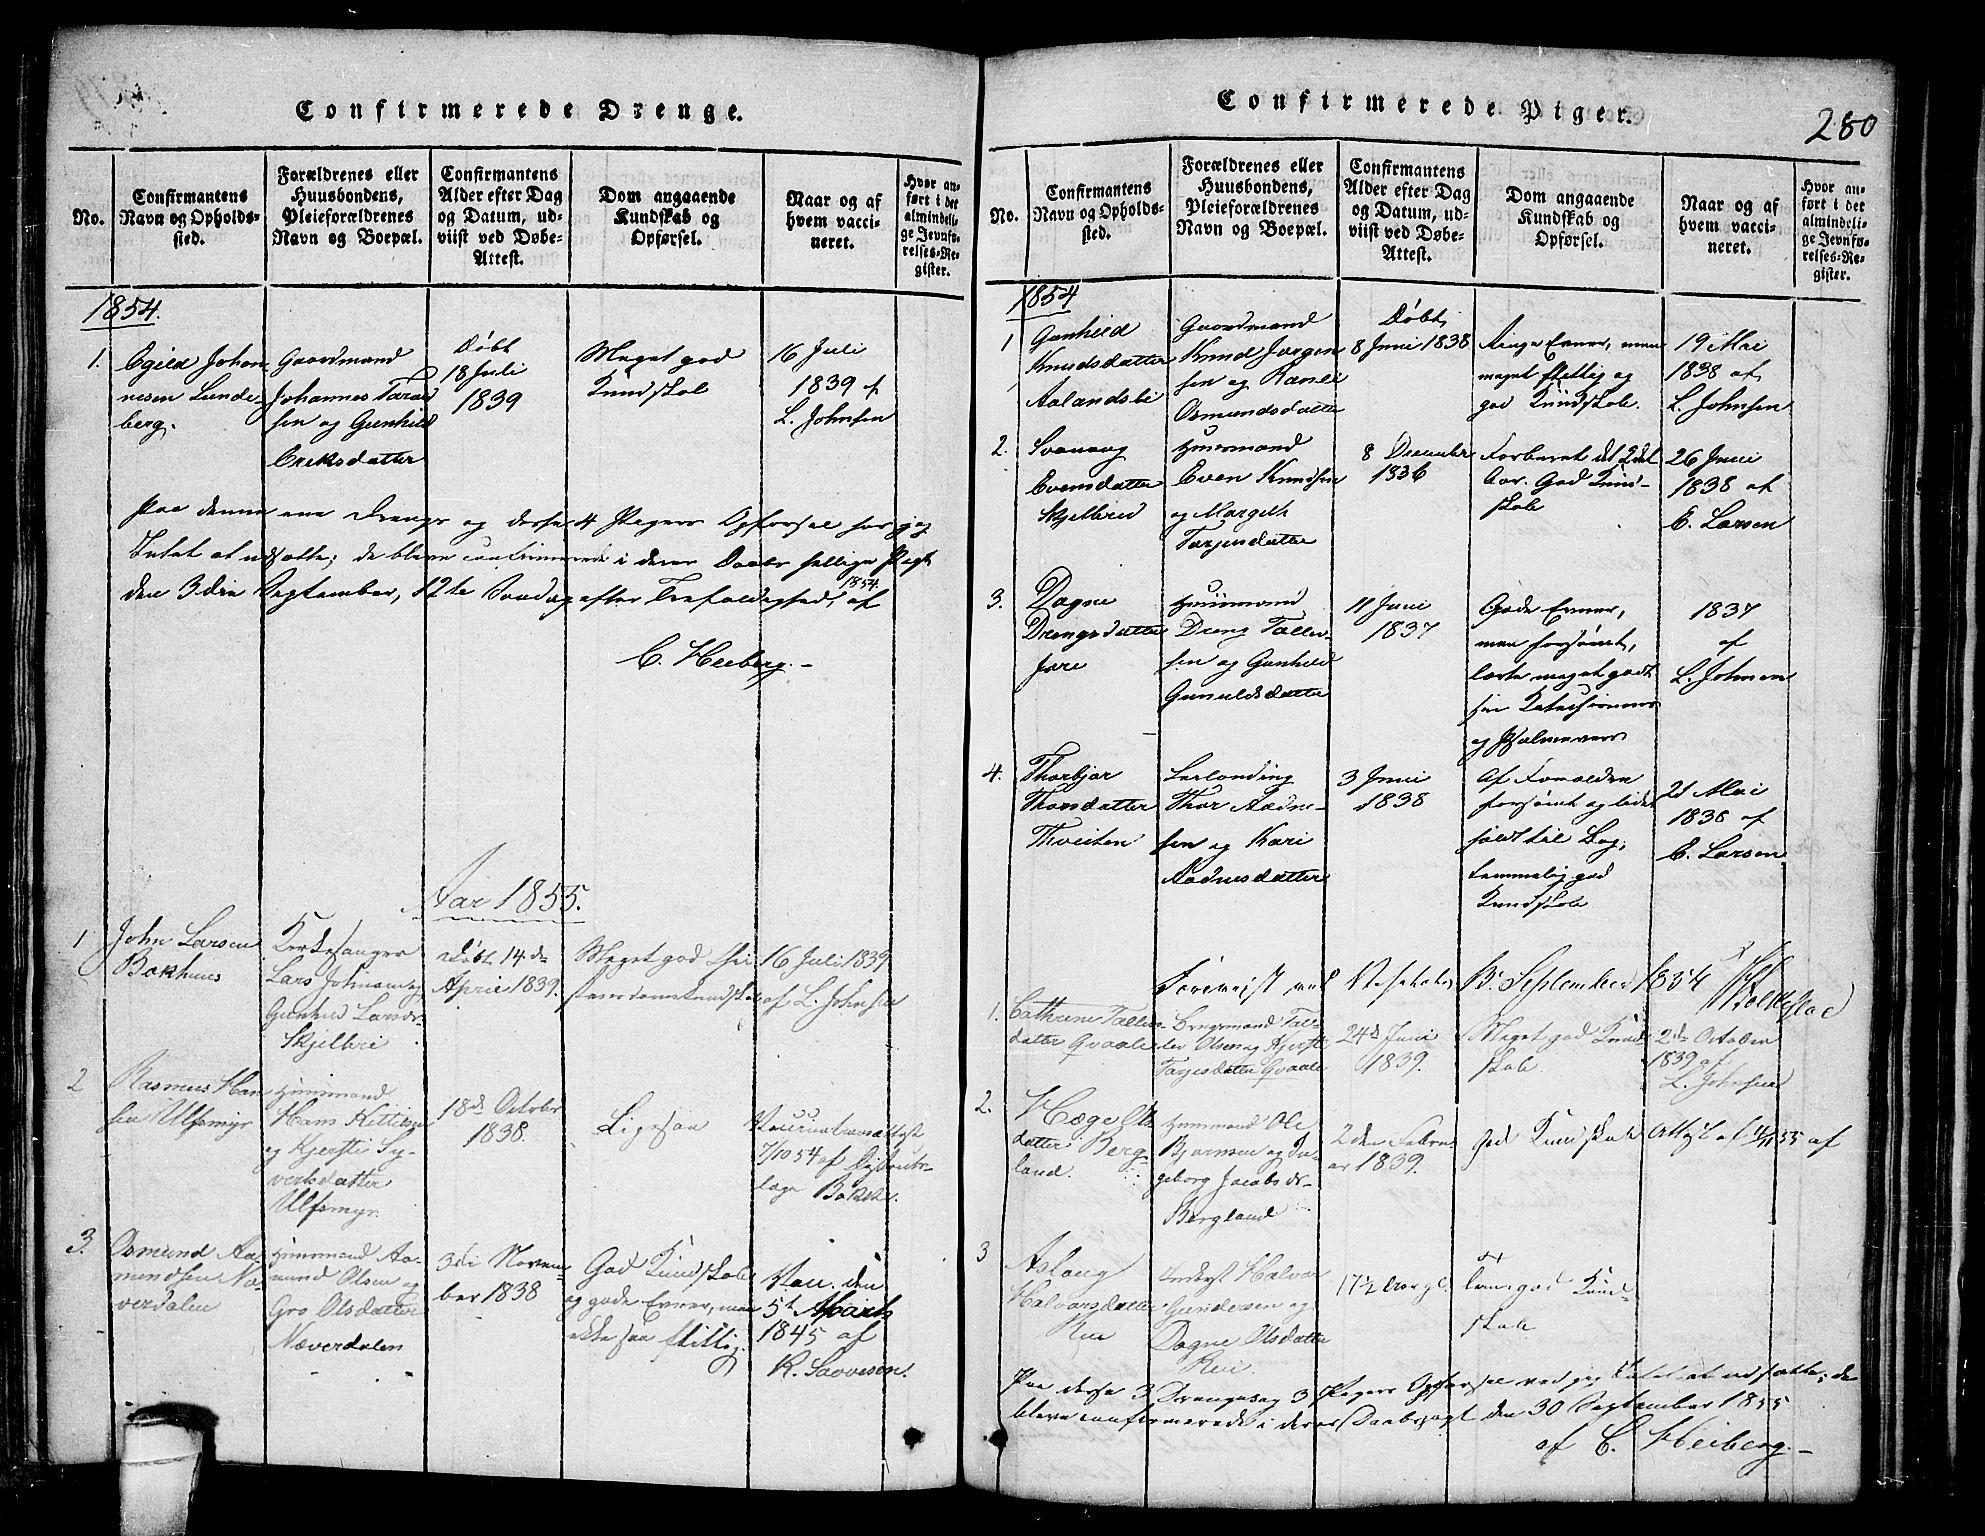 SAKO, Lårdal kirkebøker, G/Ga/L0001: Klokkerbok nr. I 1, 1815-1861, s. 280